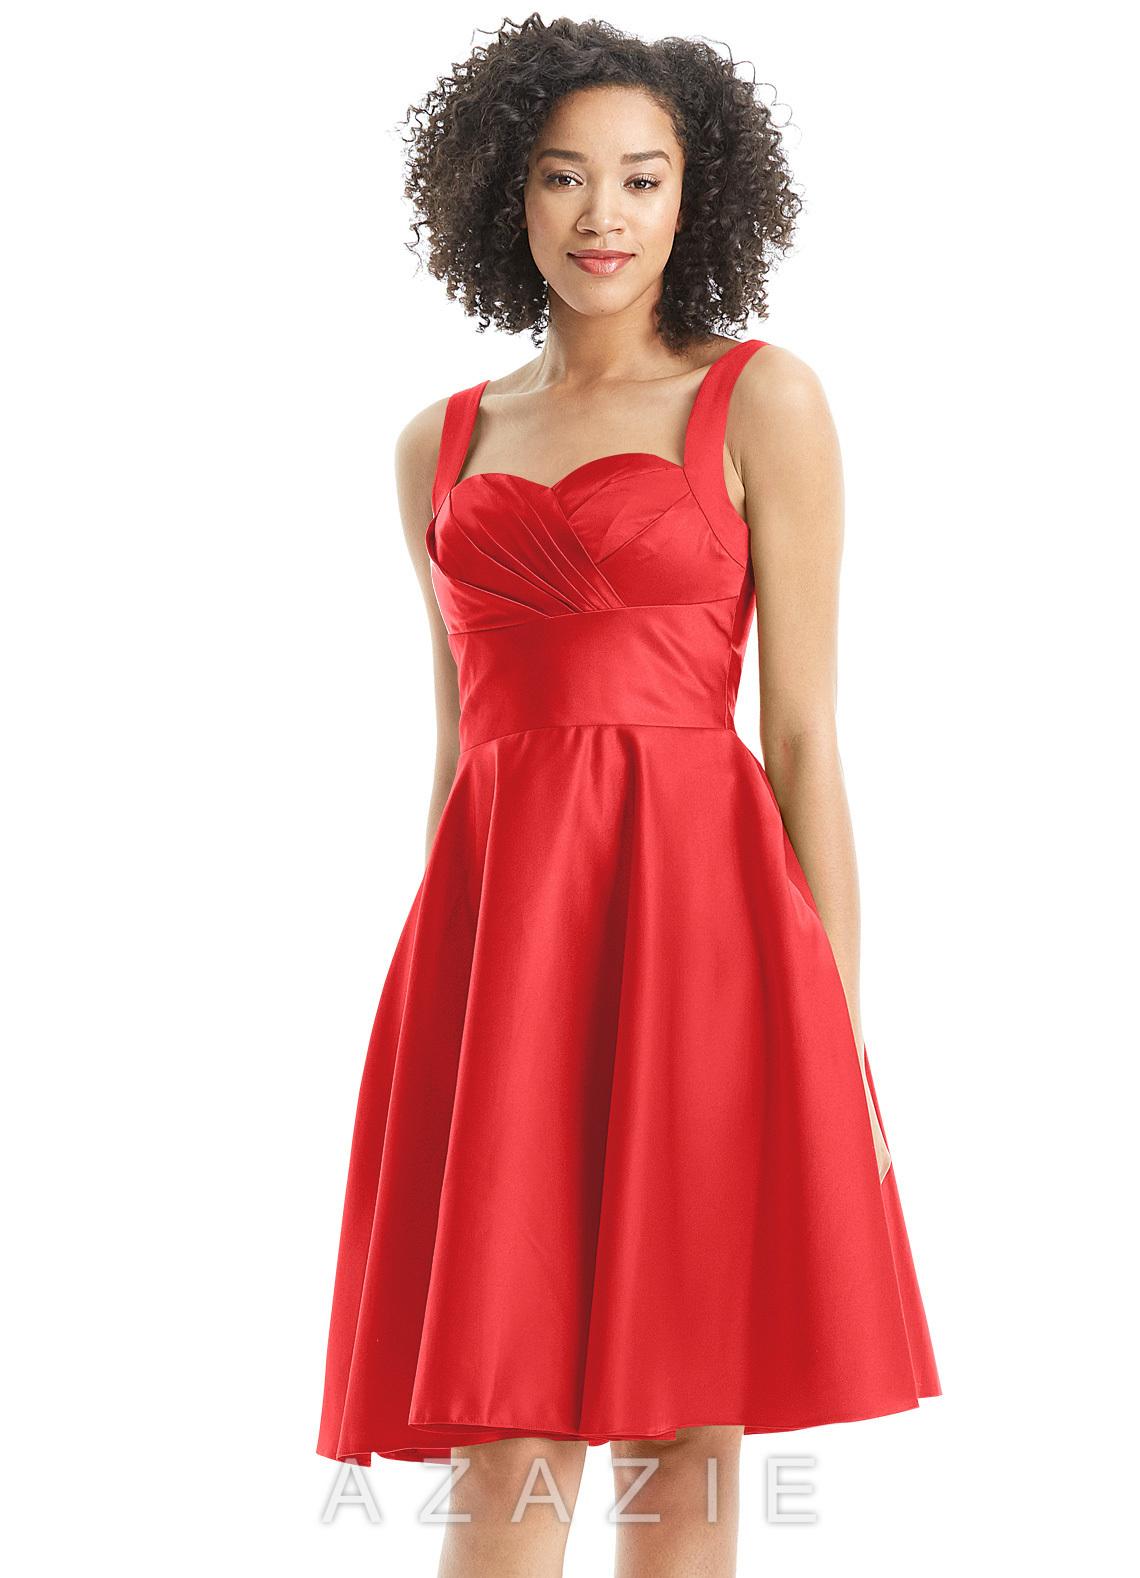 36022b1550042 Azazie Amber Bridesmaid Dress | Azazie